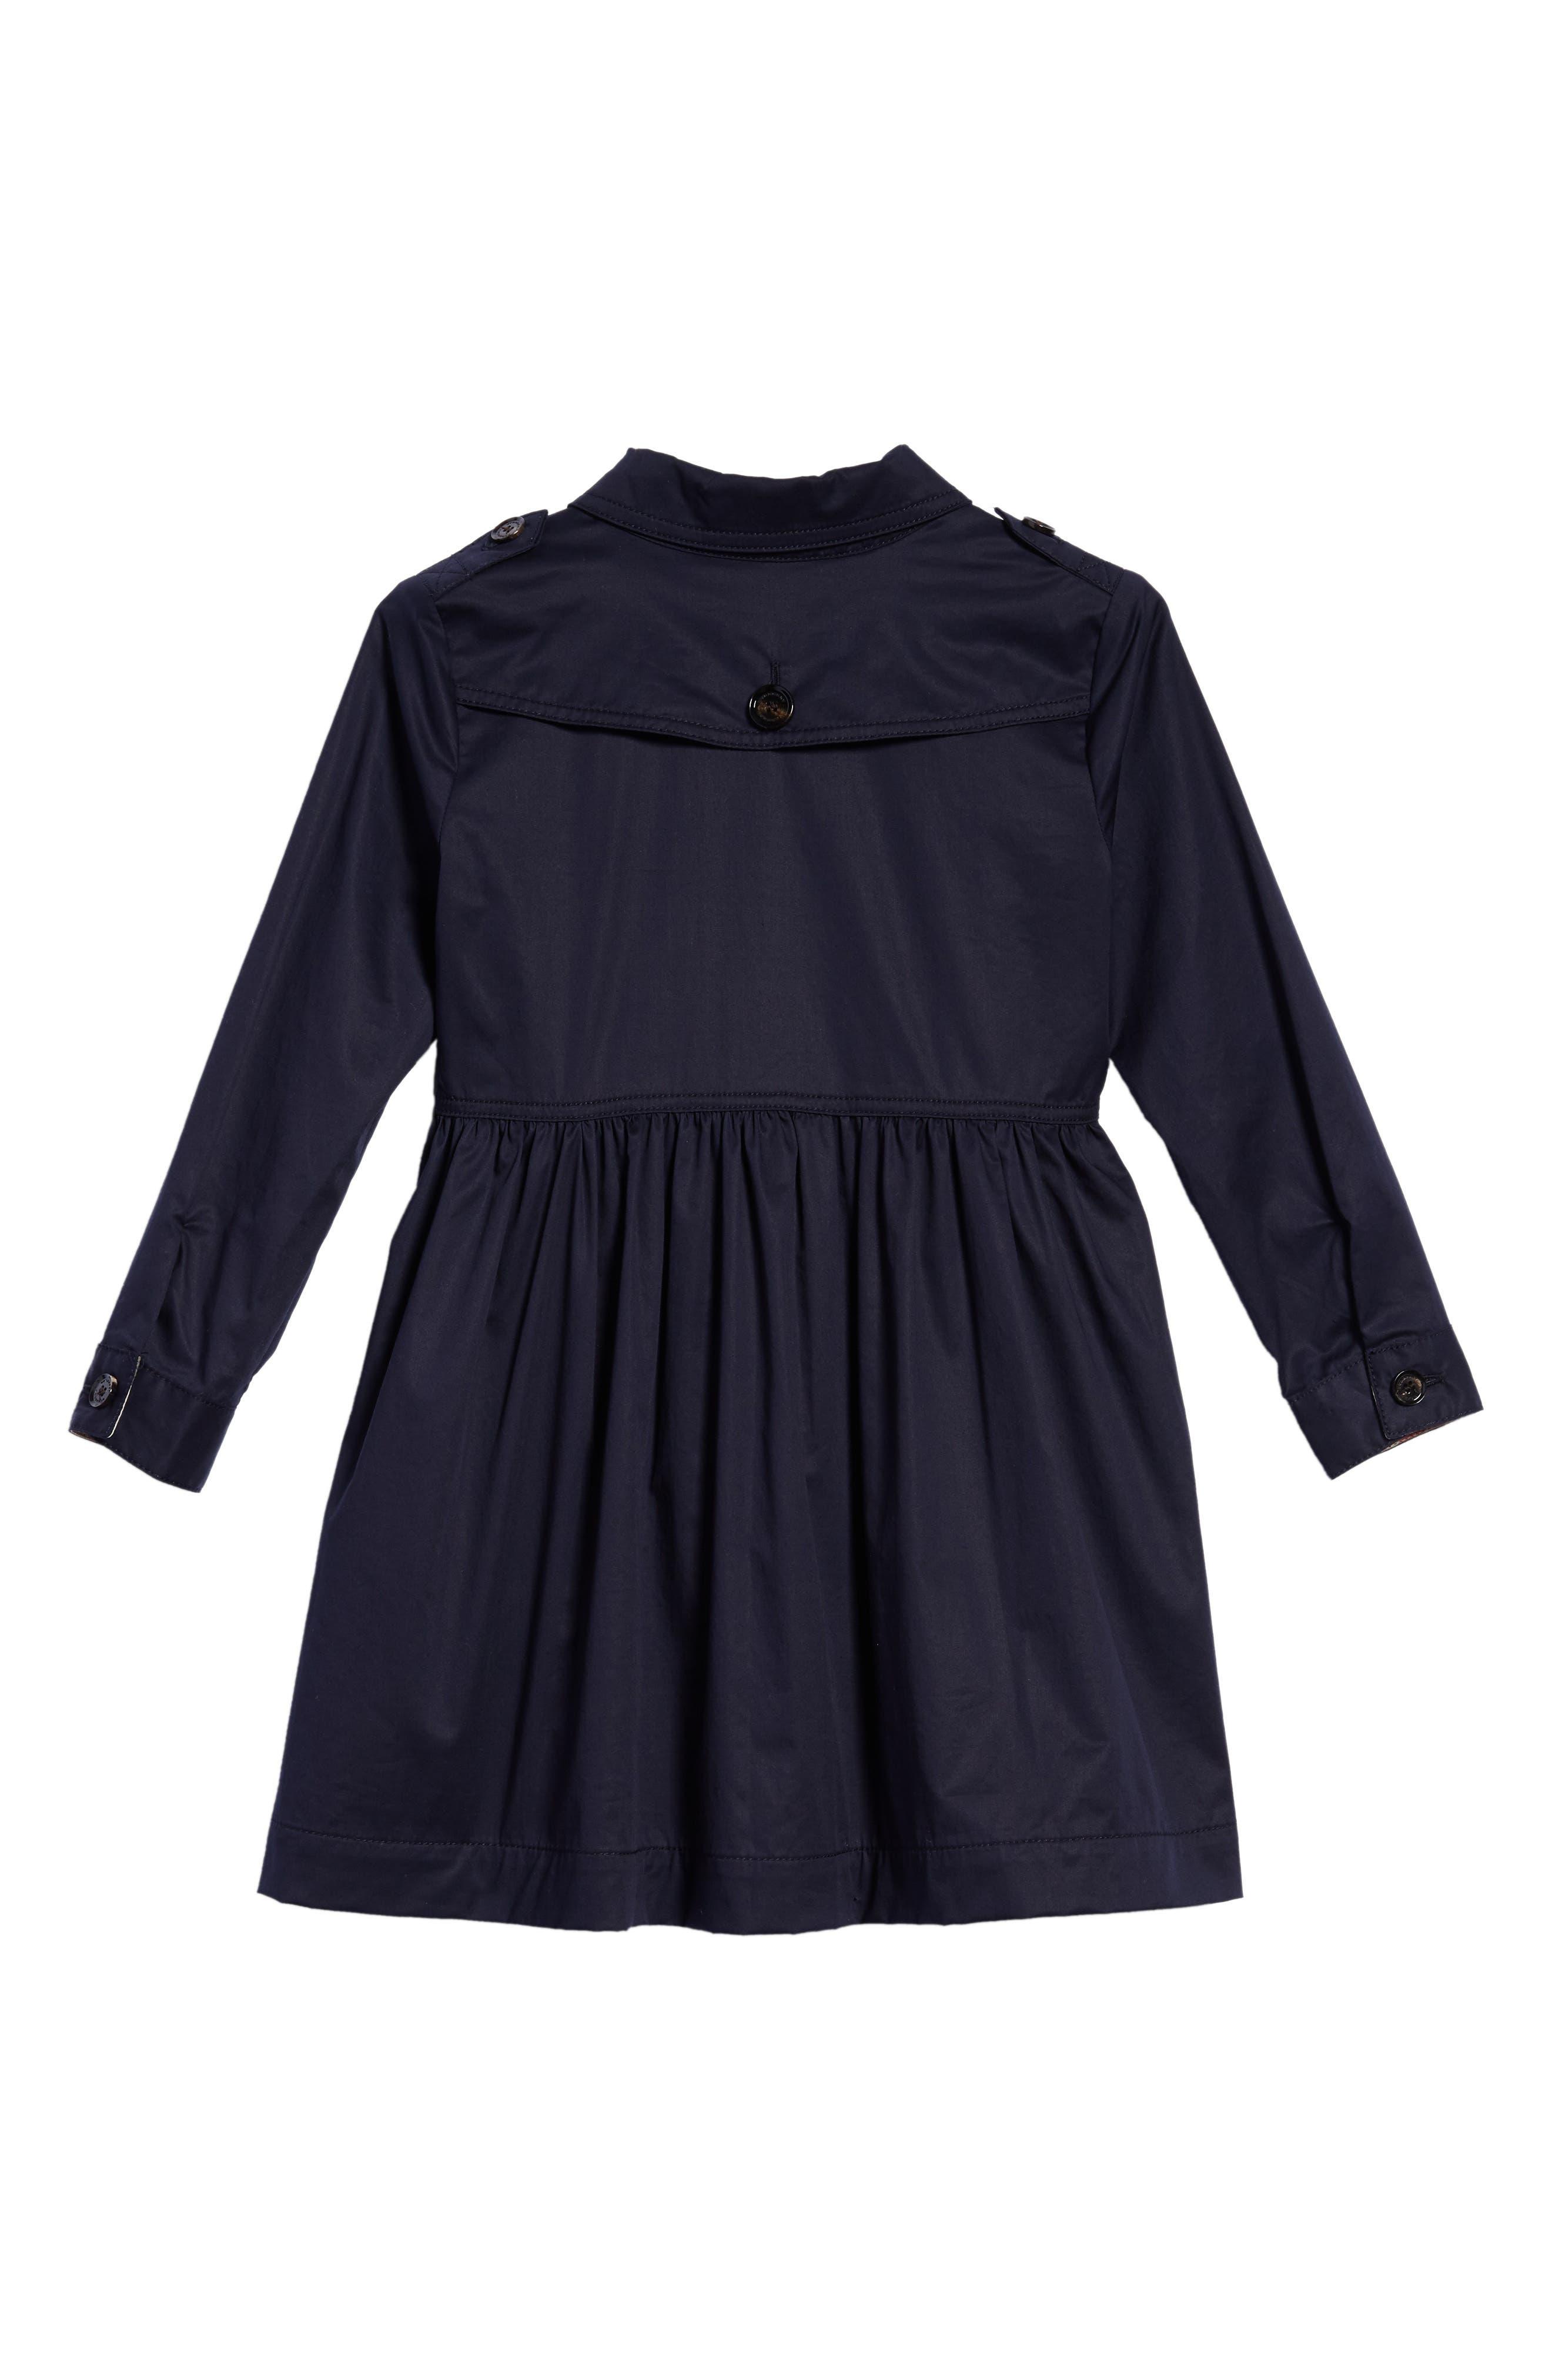 Lillyana Trench Dress,                             Alternate thumbnail 2, color,                             Midnight Blue